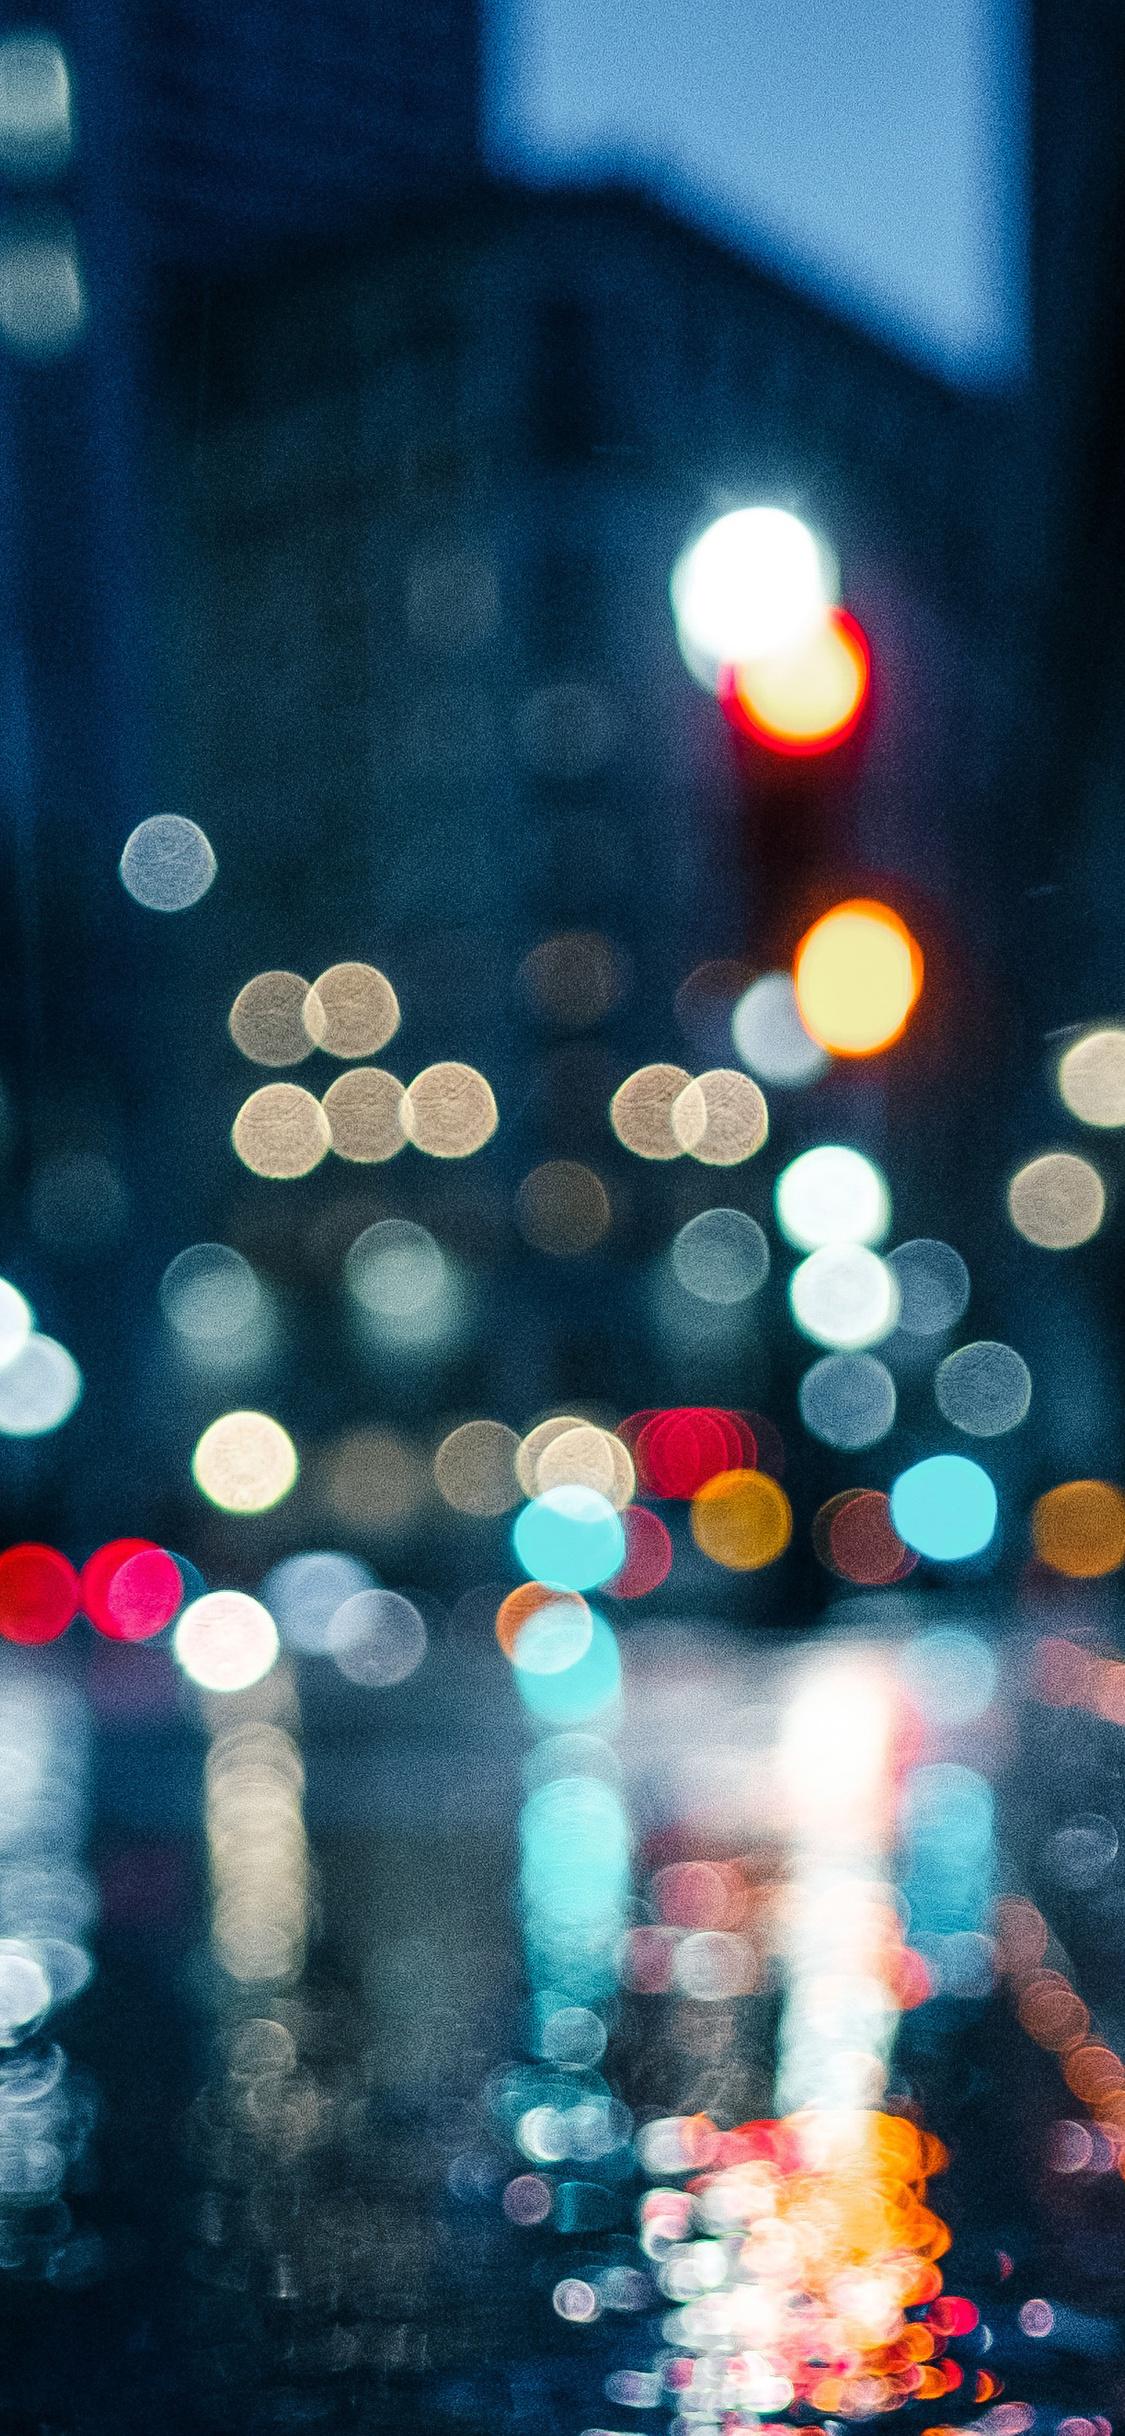 1125x2436 City Rain Blur Bokeh Effect Iphone Xs Iphone 10 Iphone X